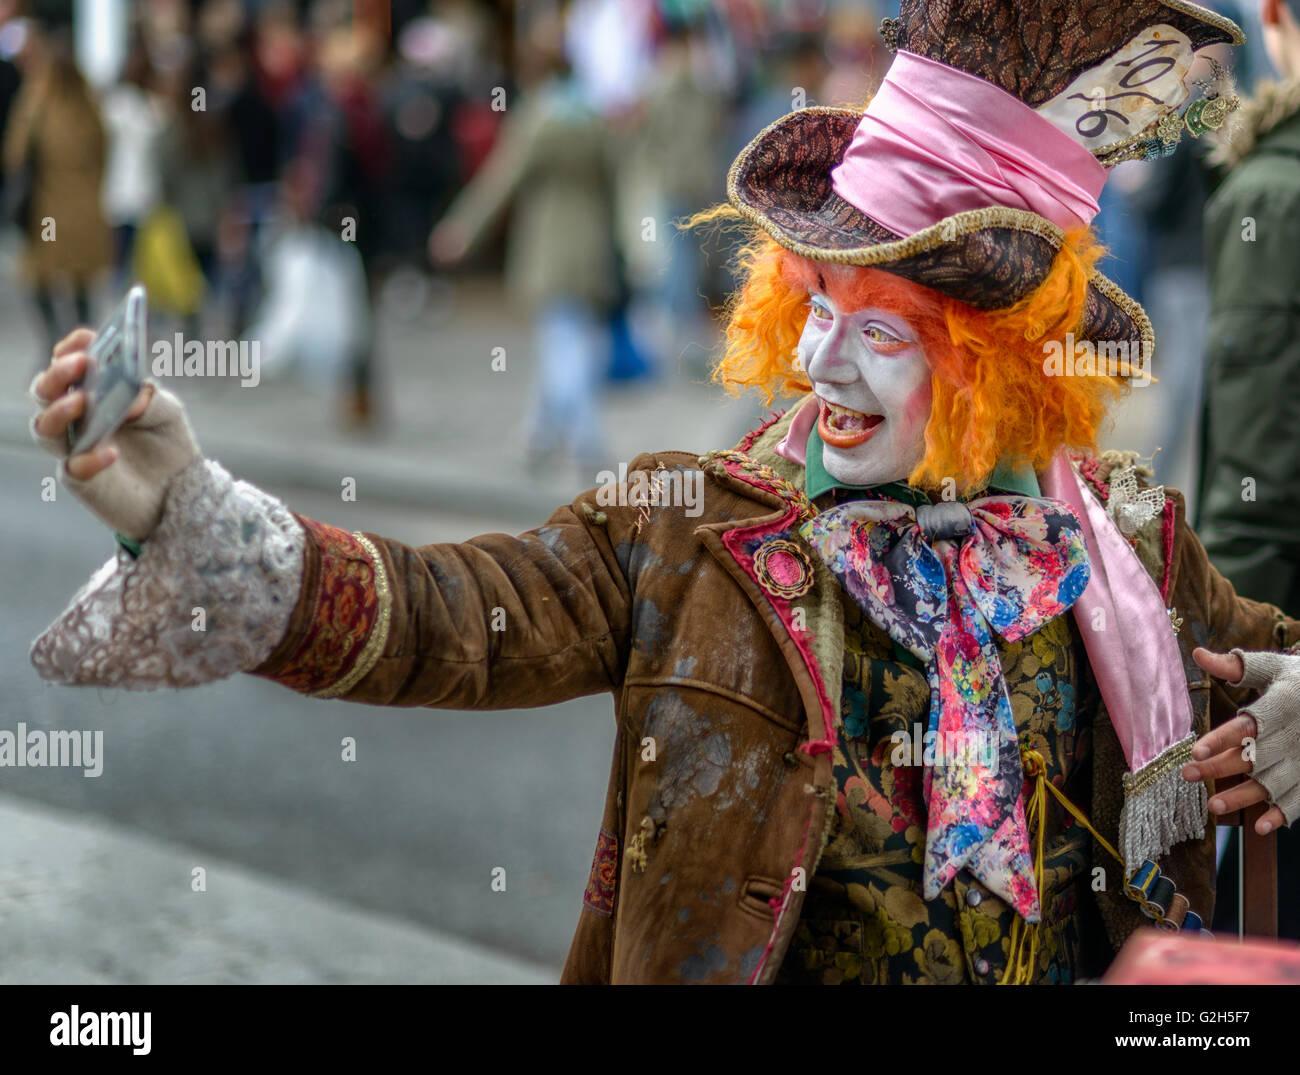 A Mad Hatter impersonator taking a selfie in Camden, near Camden Lock, London, UK - Stock Image